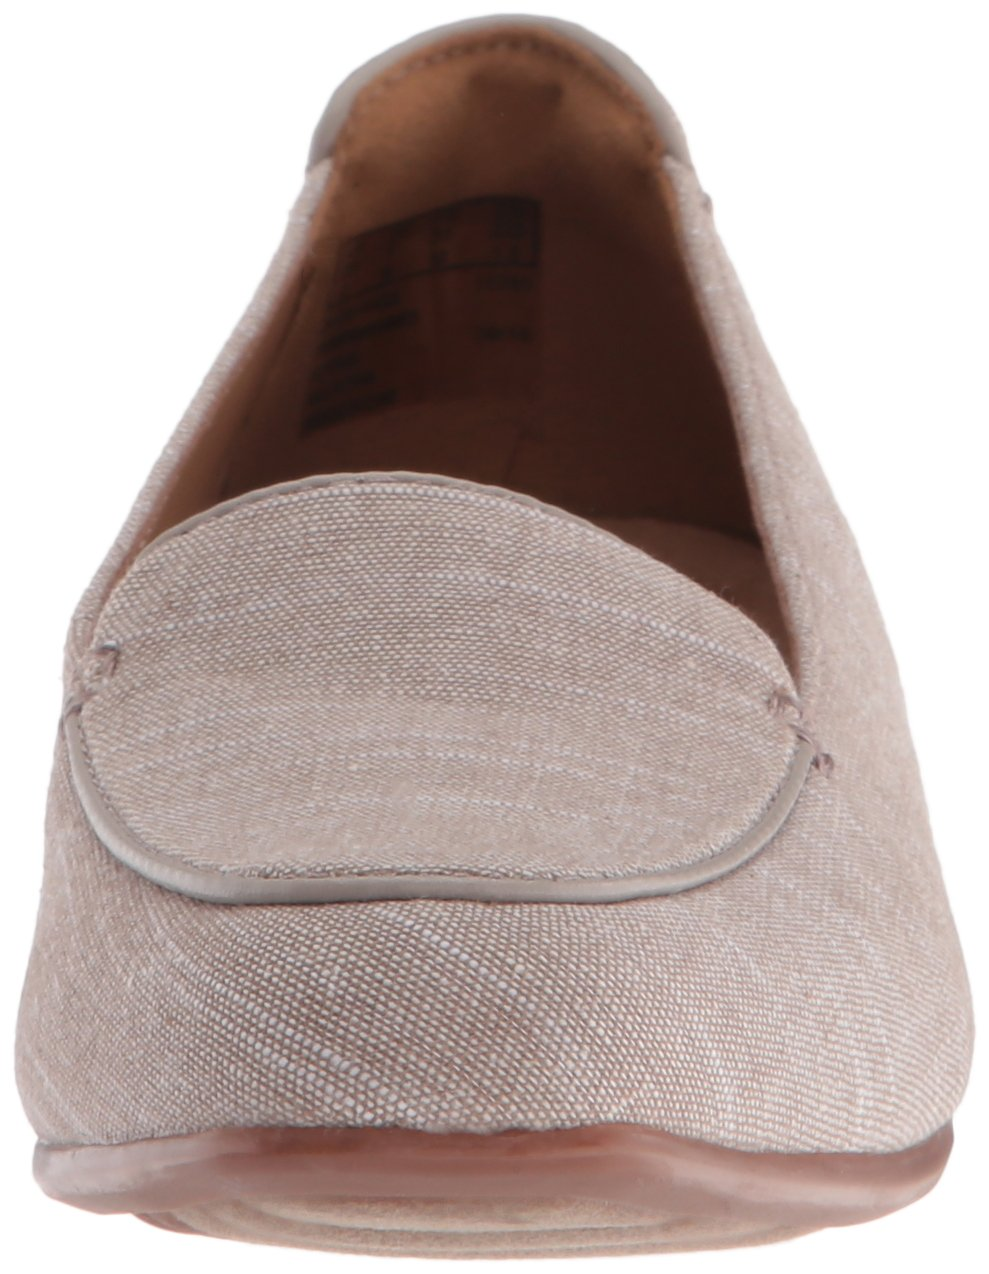 CLARKS Women's B01FH9IOAQ Keesha Luca Slip-On Loafer B01FH9IOAQ Women's 12 N US|Taupe Linen dcdebf